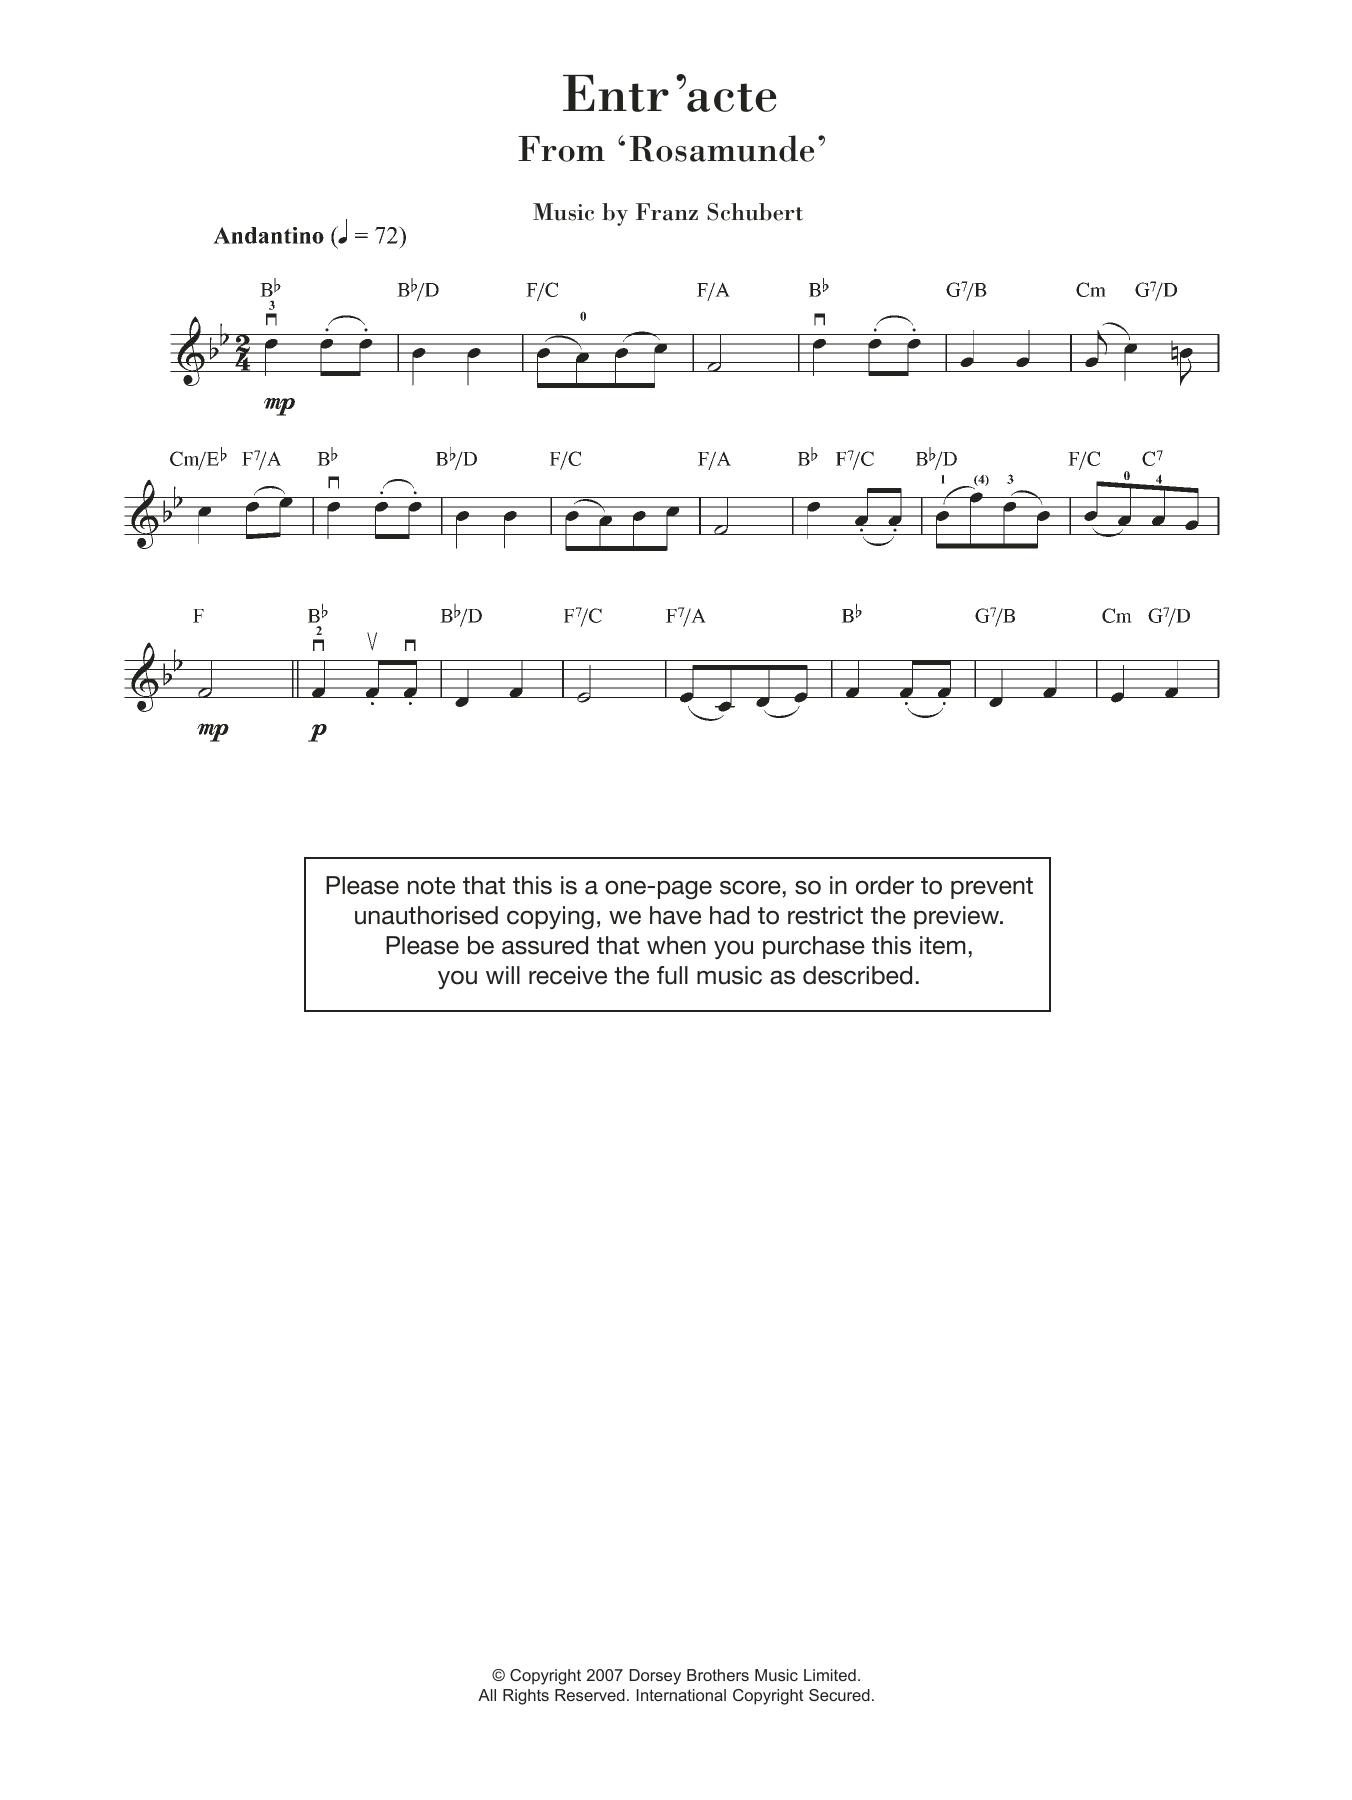 Franz Schubert - Rosamunde Entr'acte